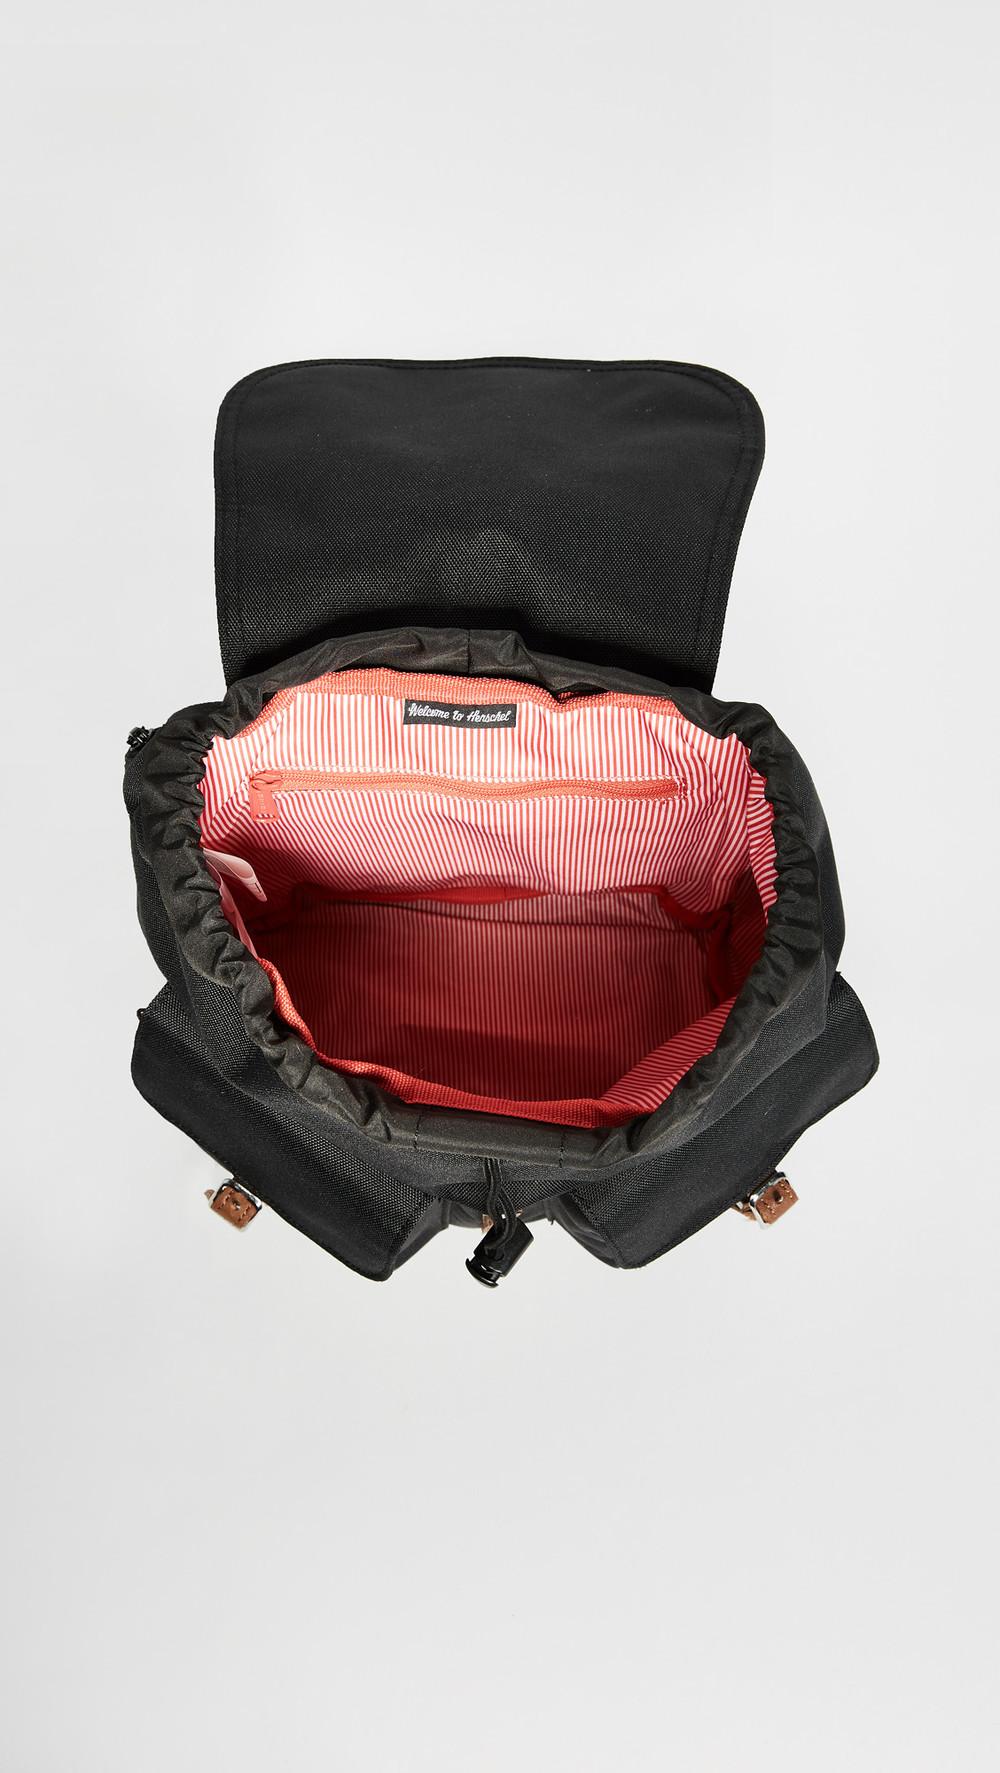 Herschel Supply Co. Herschel Supply Co. Dawson X-Small Backpack in black / tan